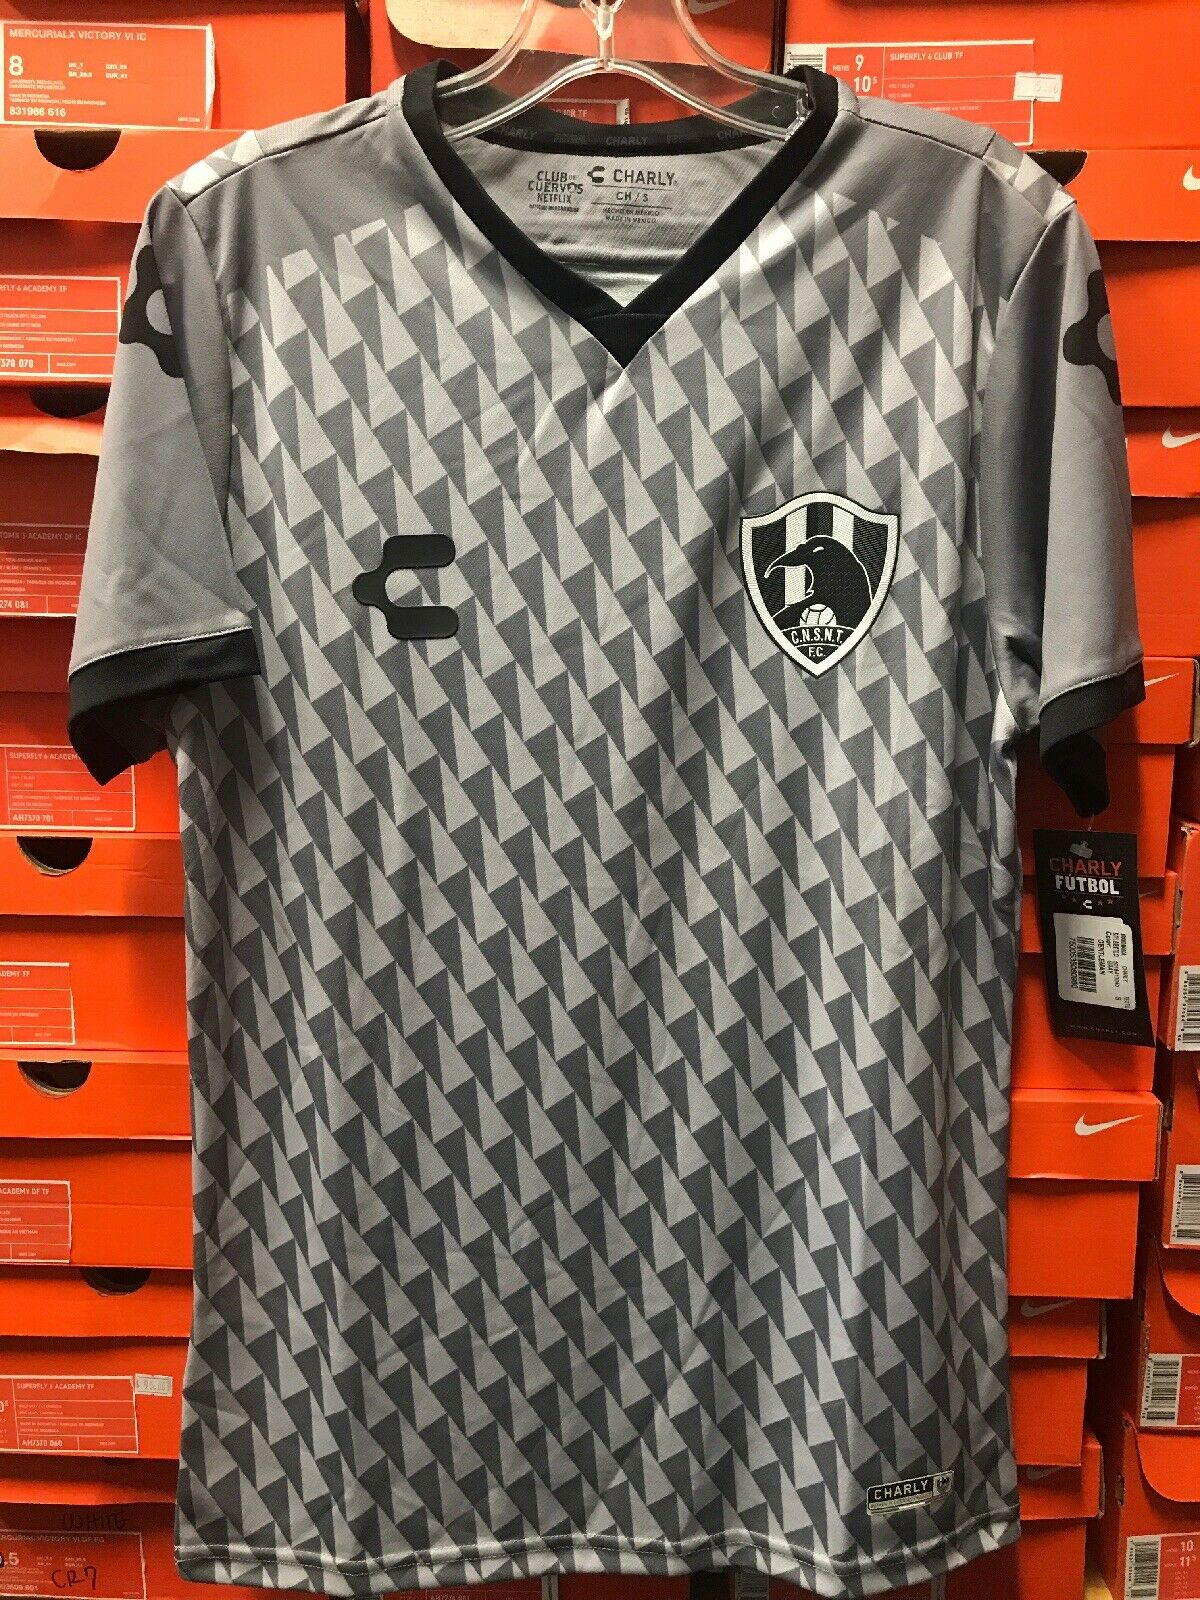 Club de cuervos temporada 4 Jersey 2019 Marca Charly Talla XL Talla XL